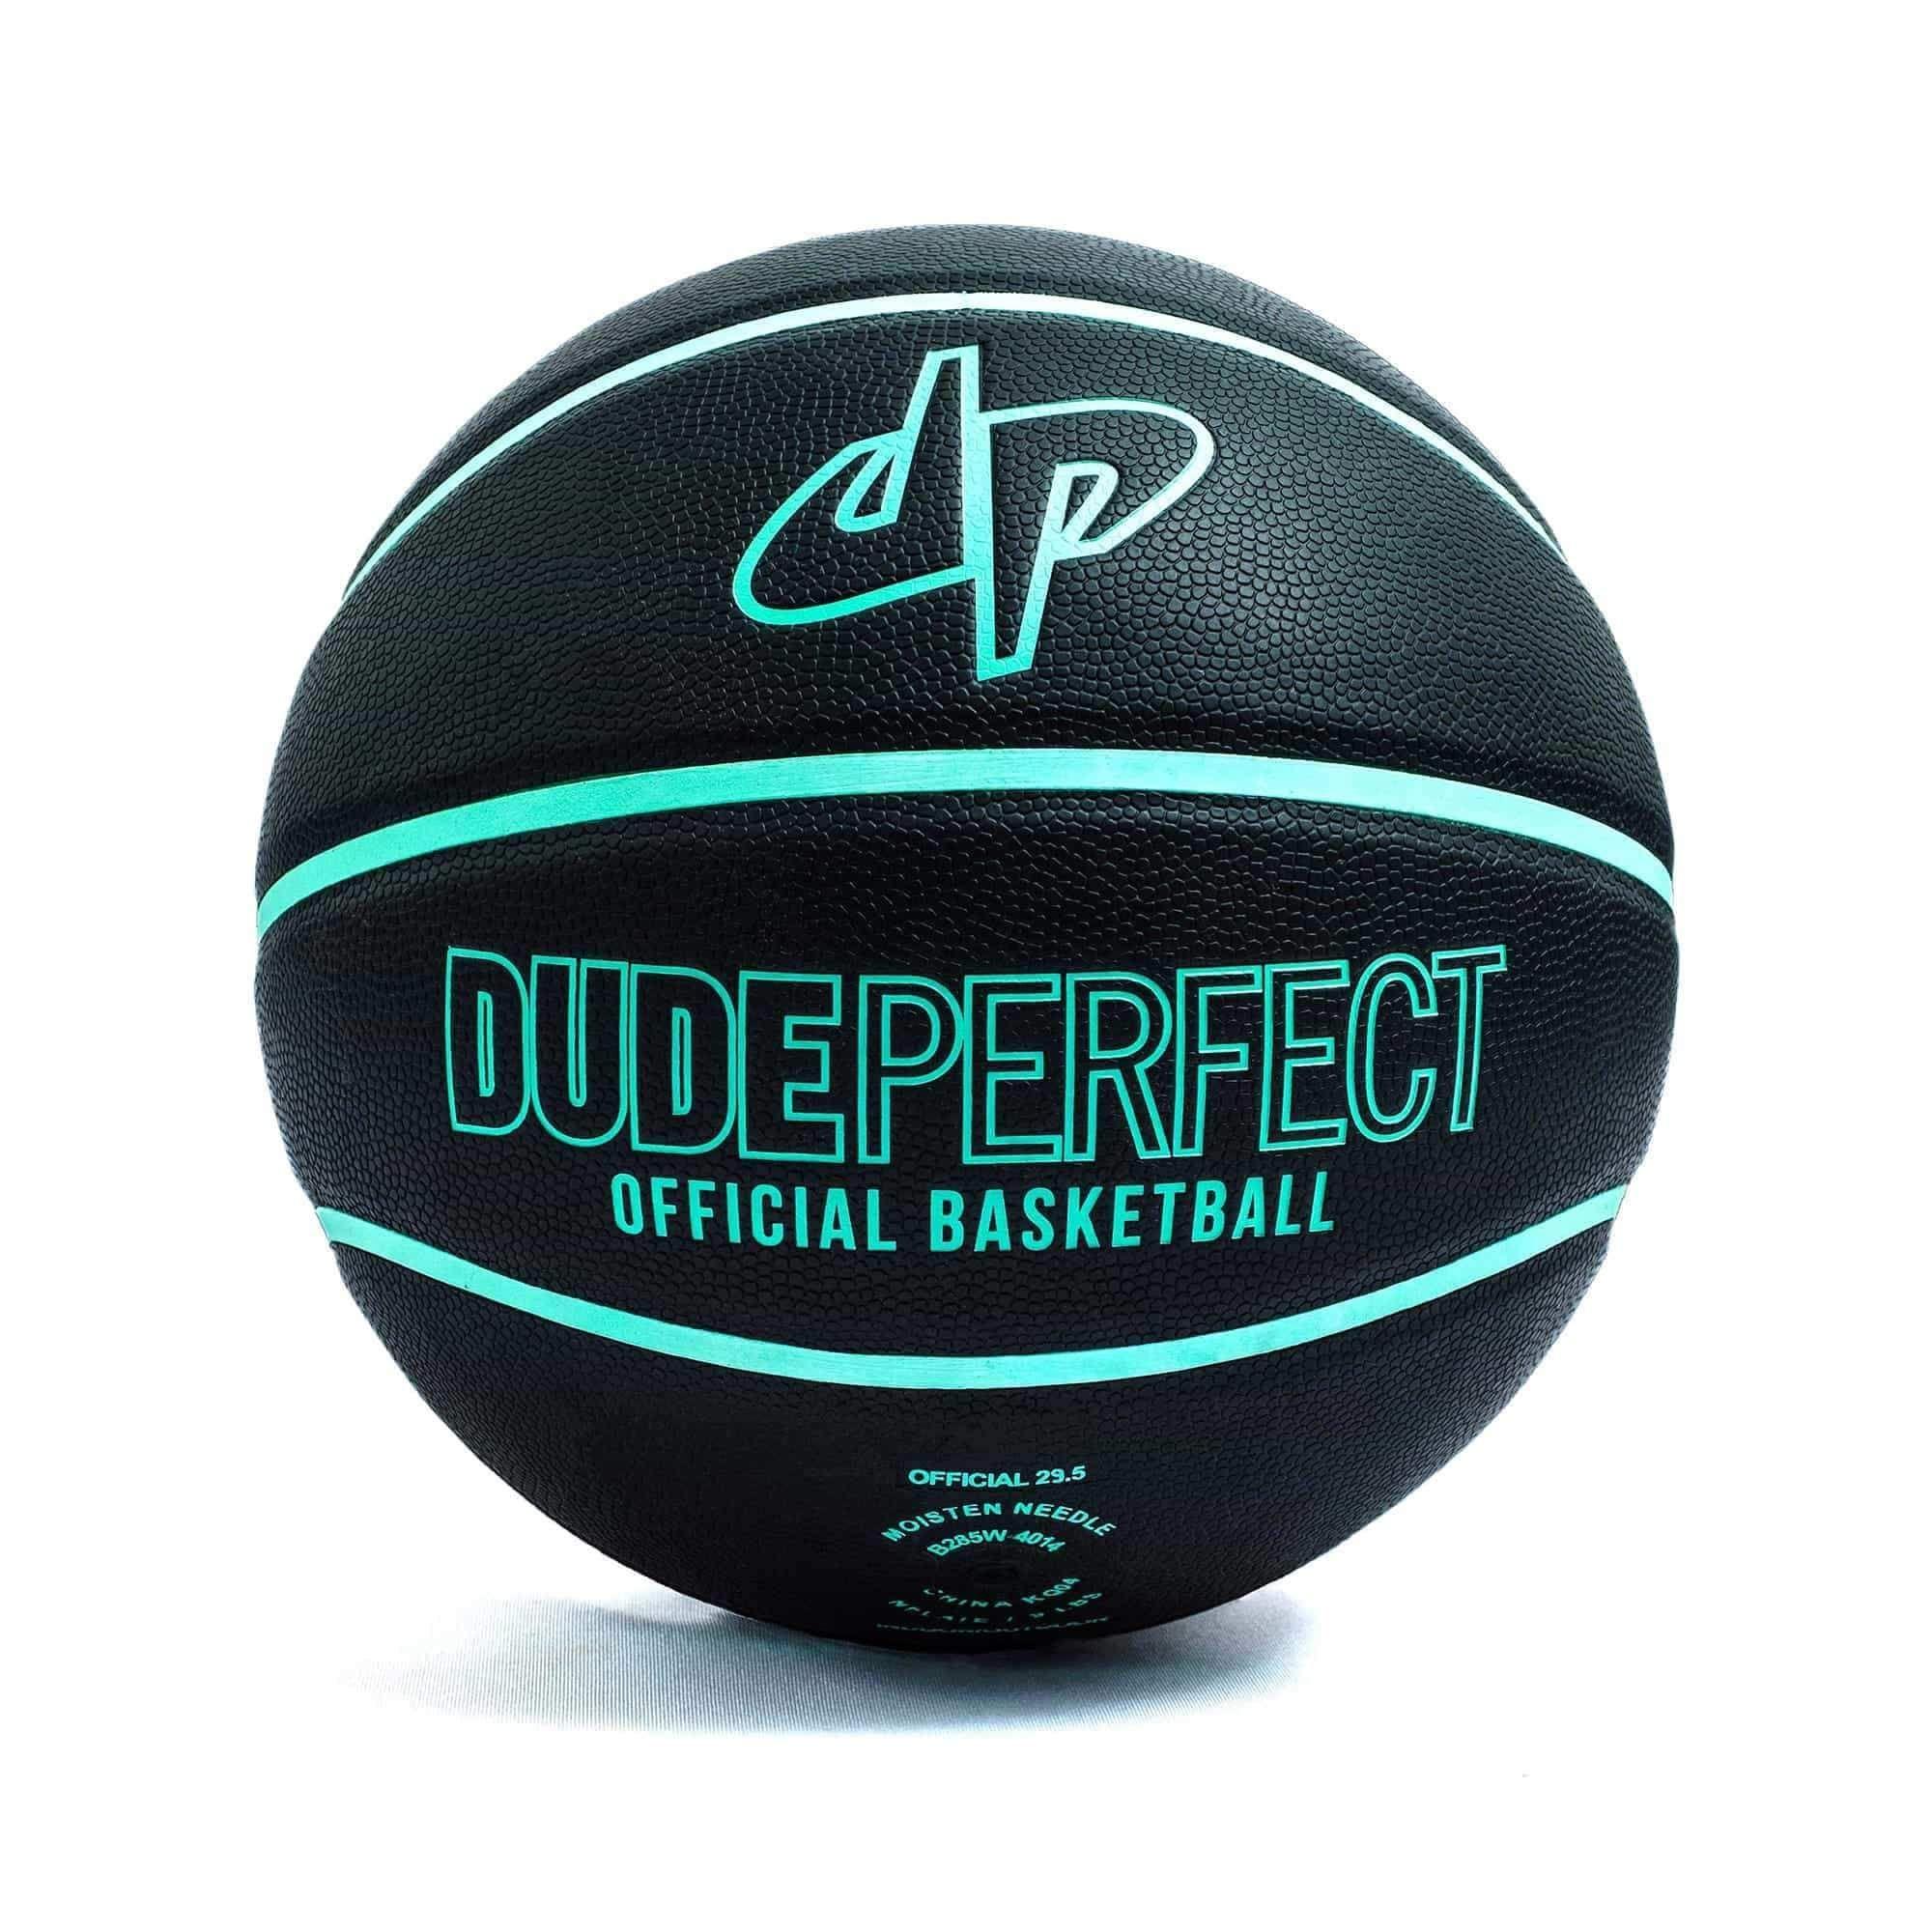 Basketball BlackGreenDude Perfect BlackGreenDude Basketball Basketball Basketball BlackGreenDude BlackGreenDude Perfect Perfect zGMSUqpV